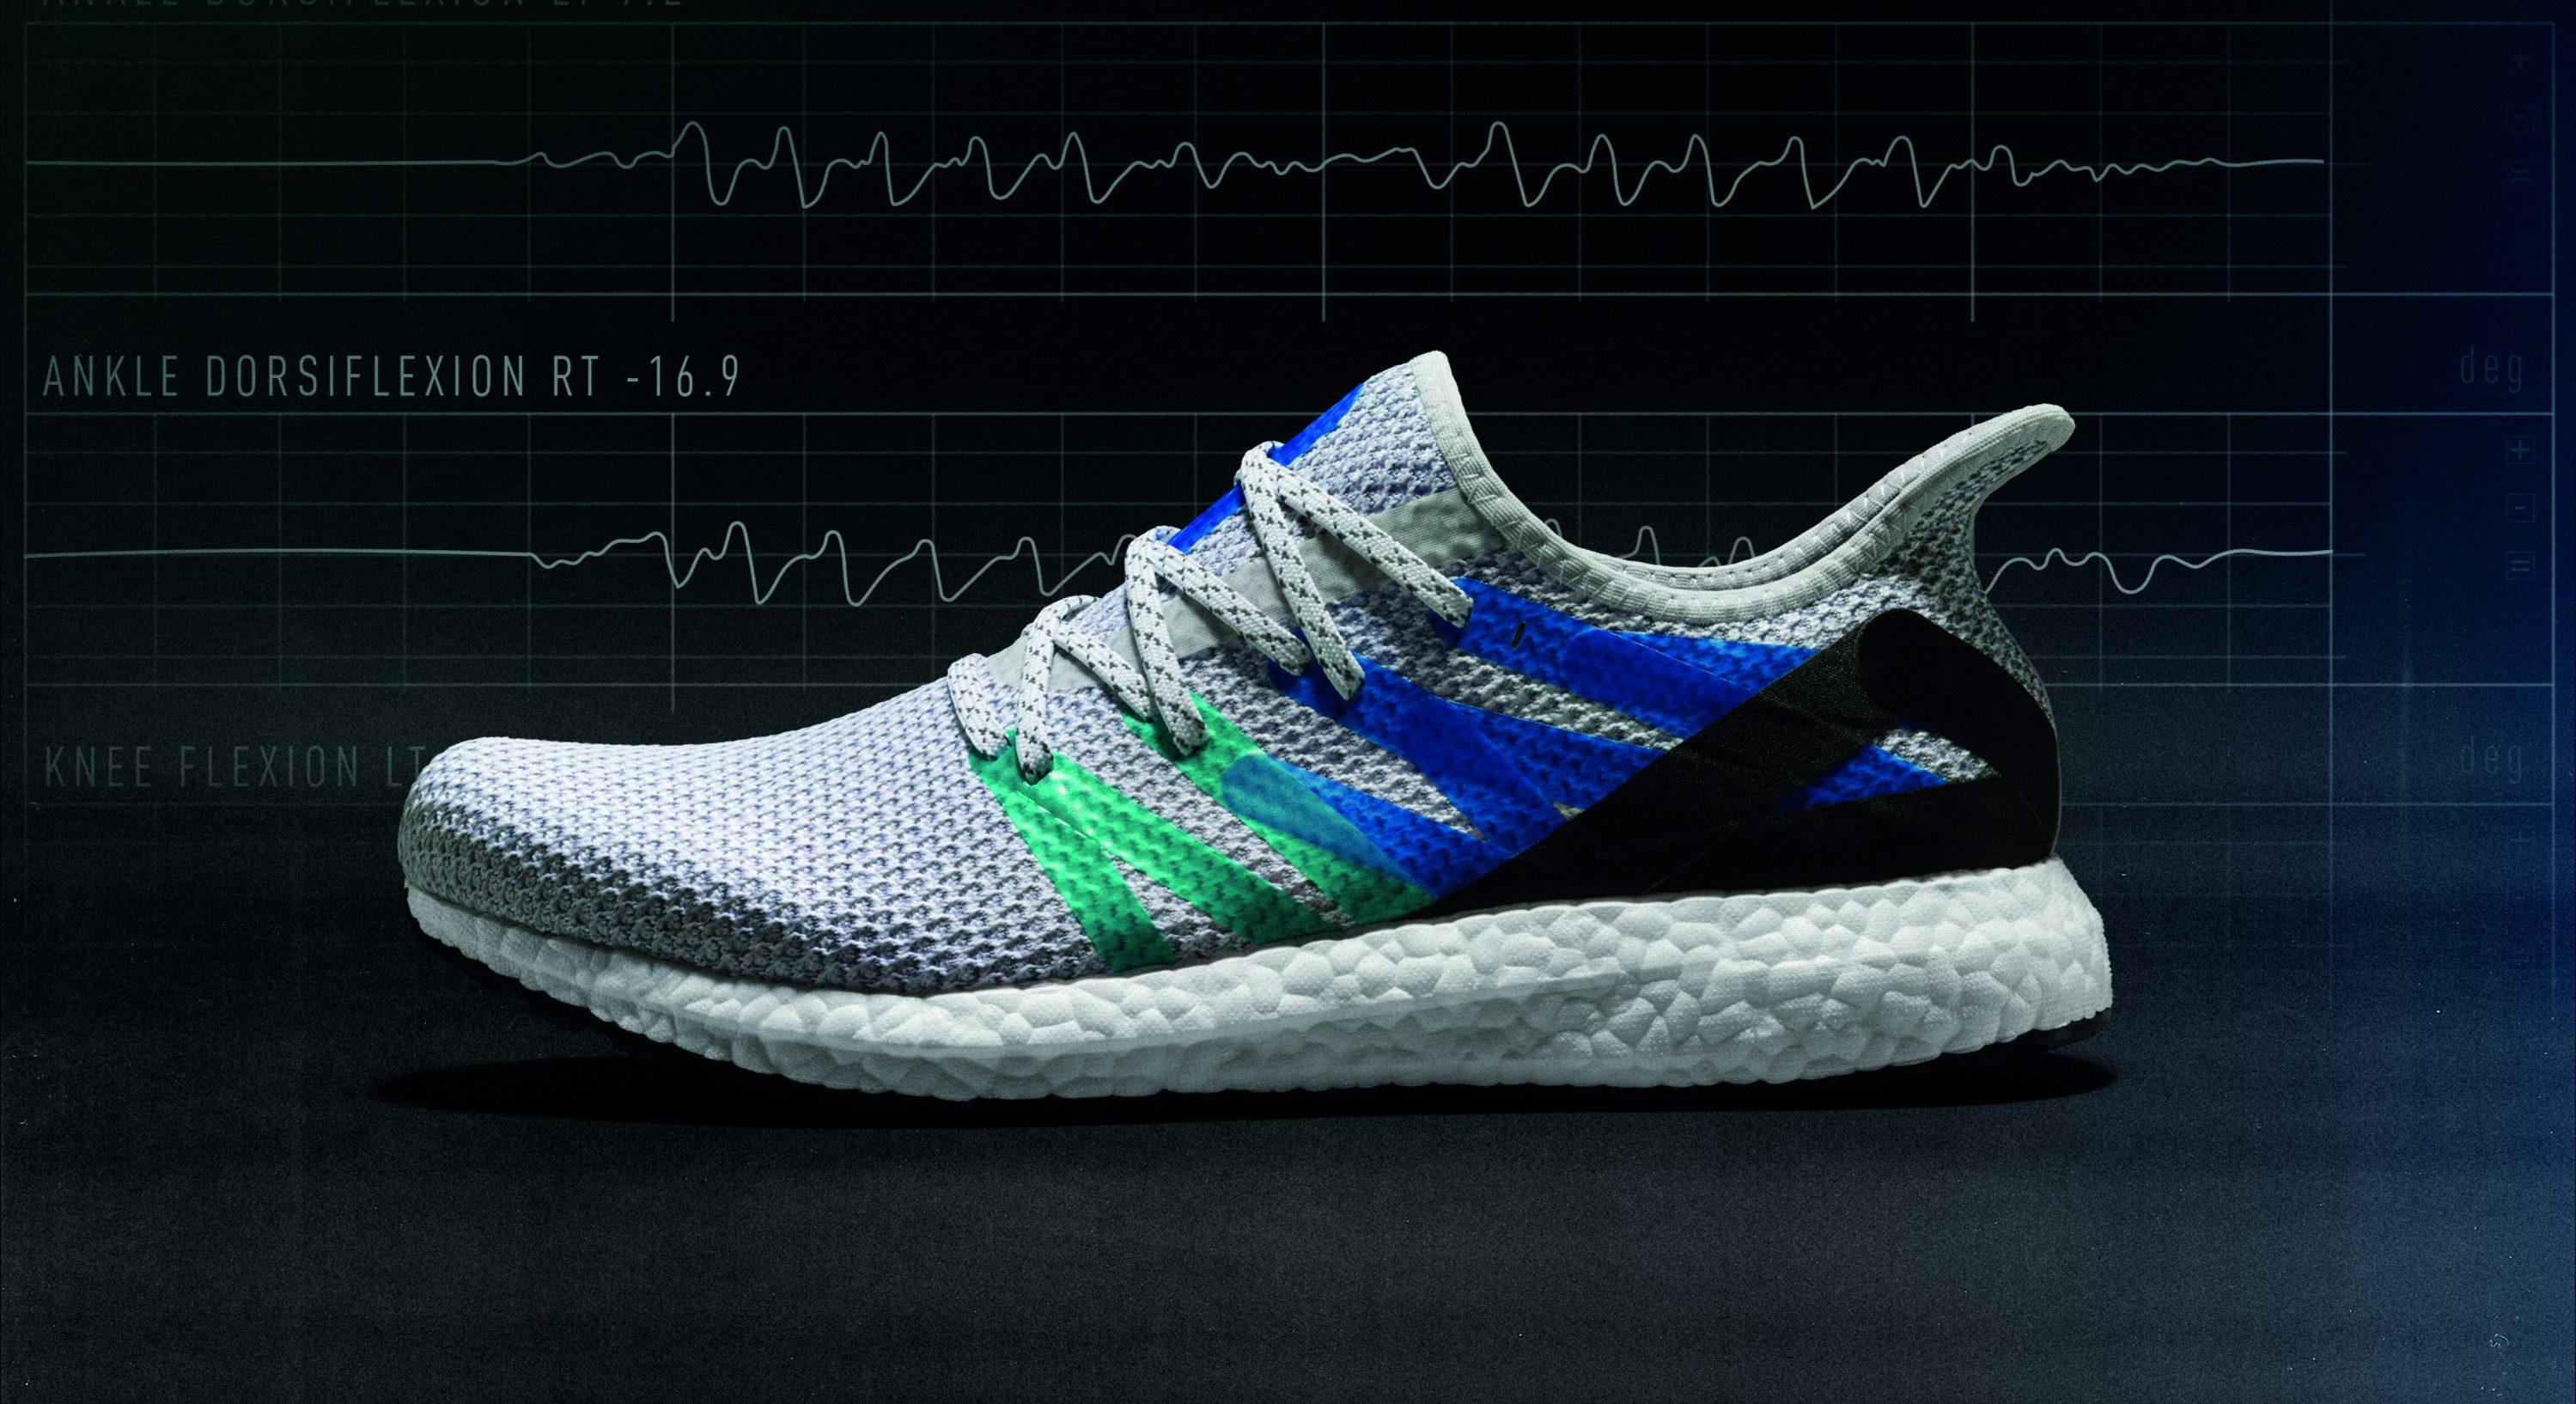 Adidas AM4LDN